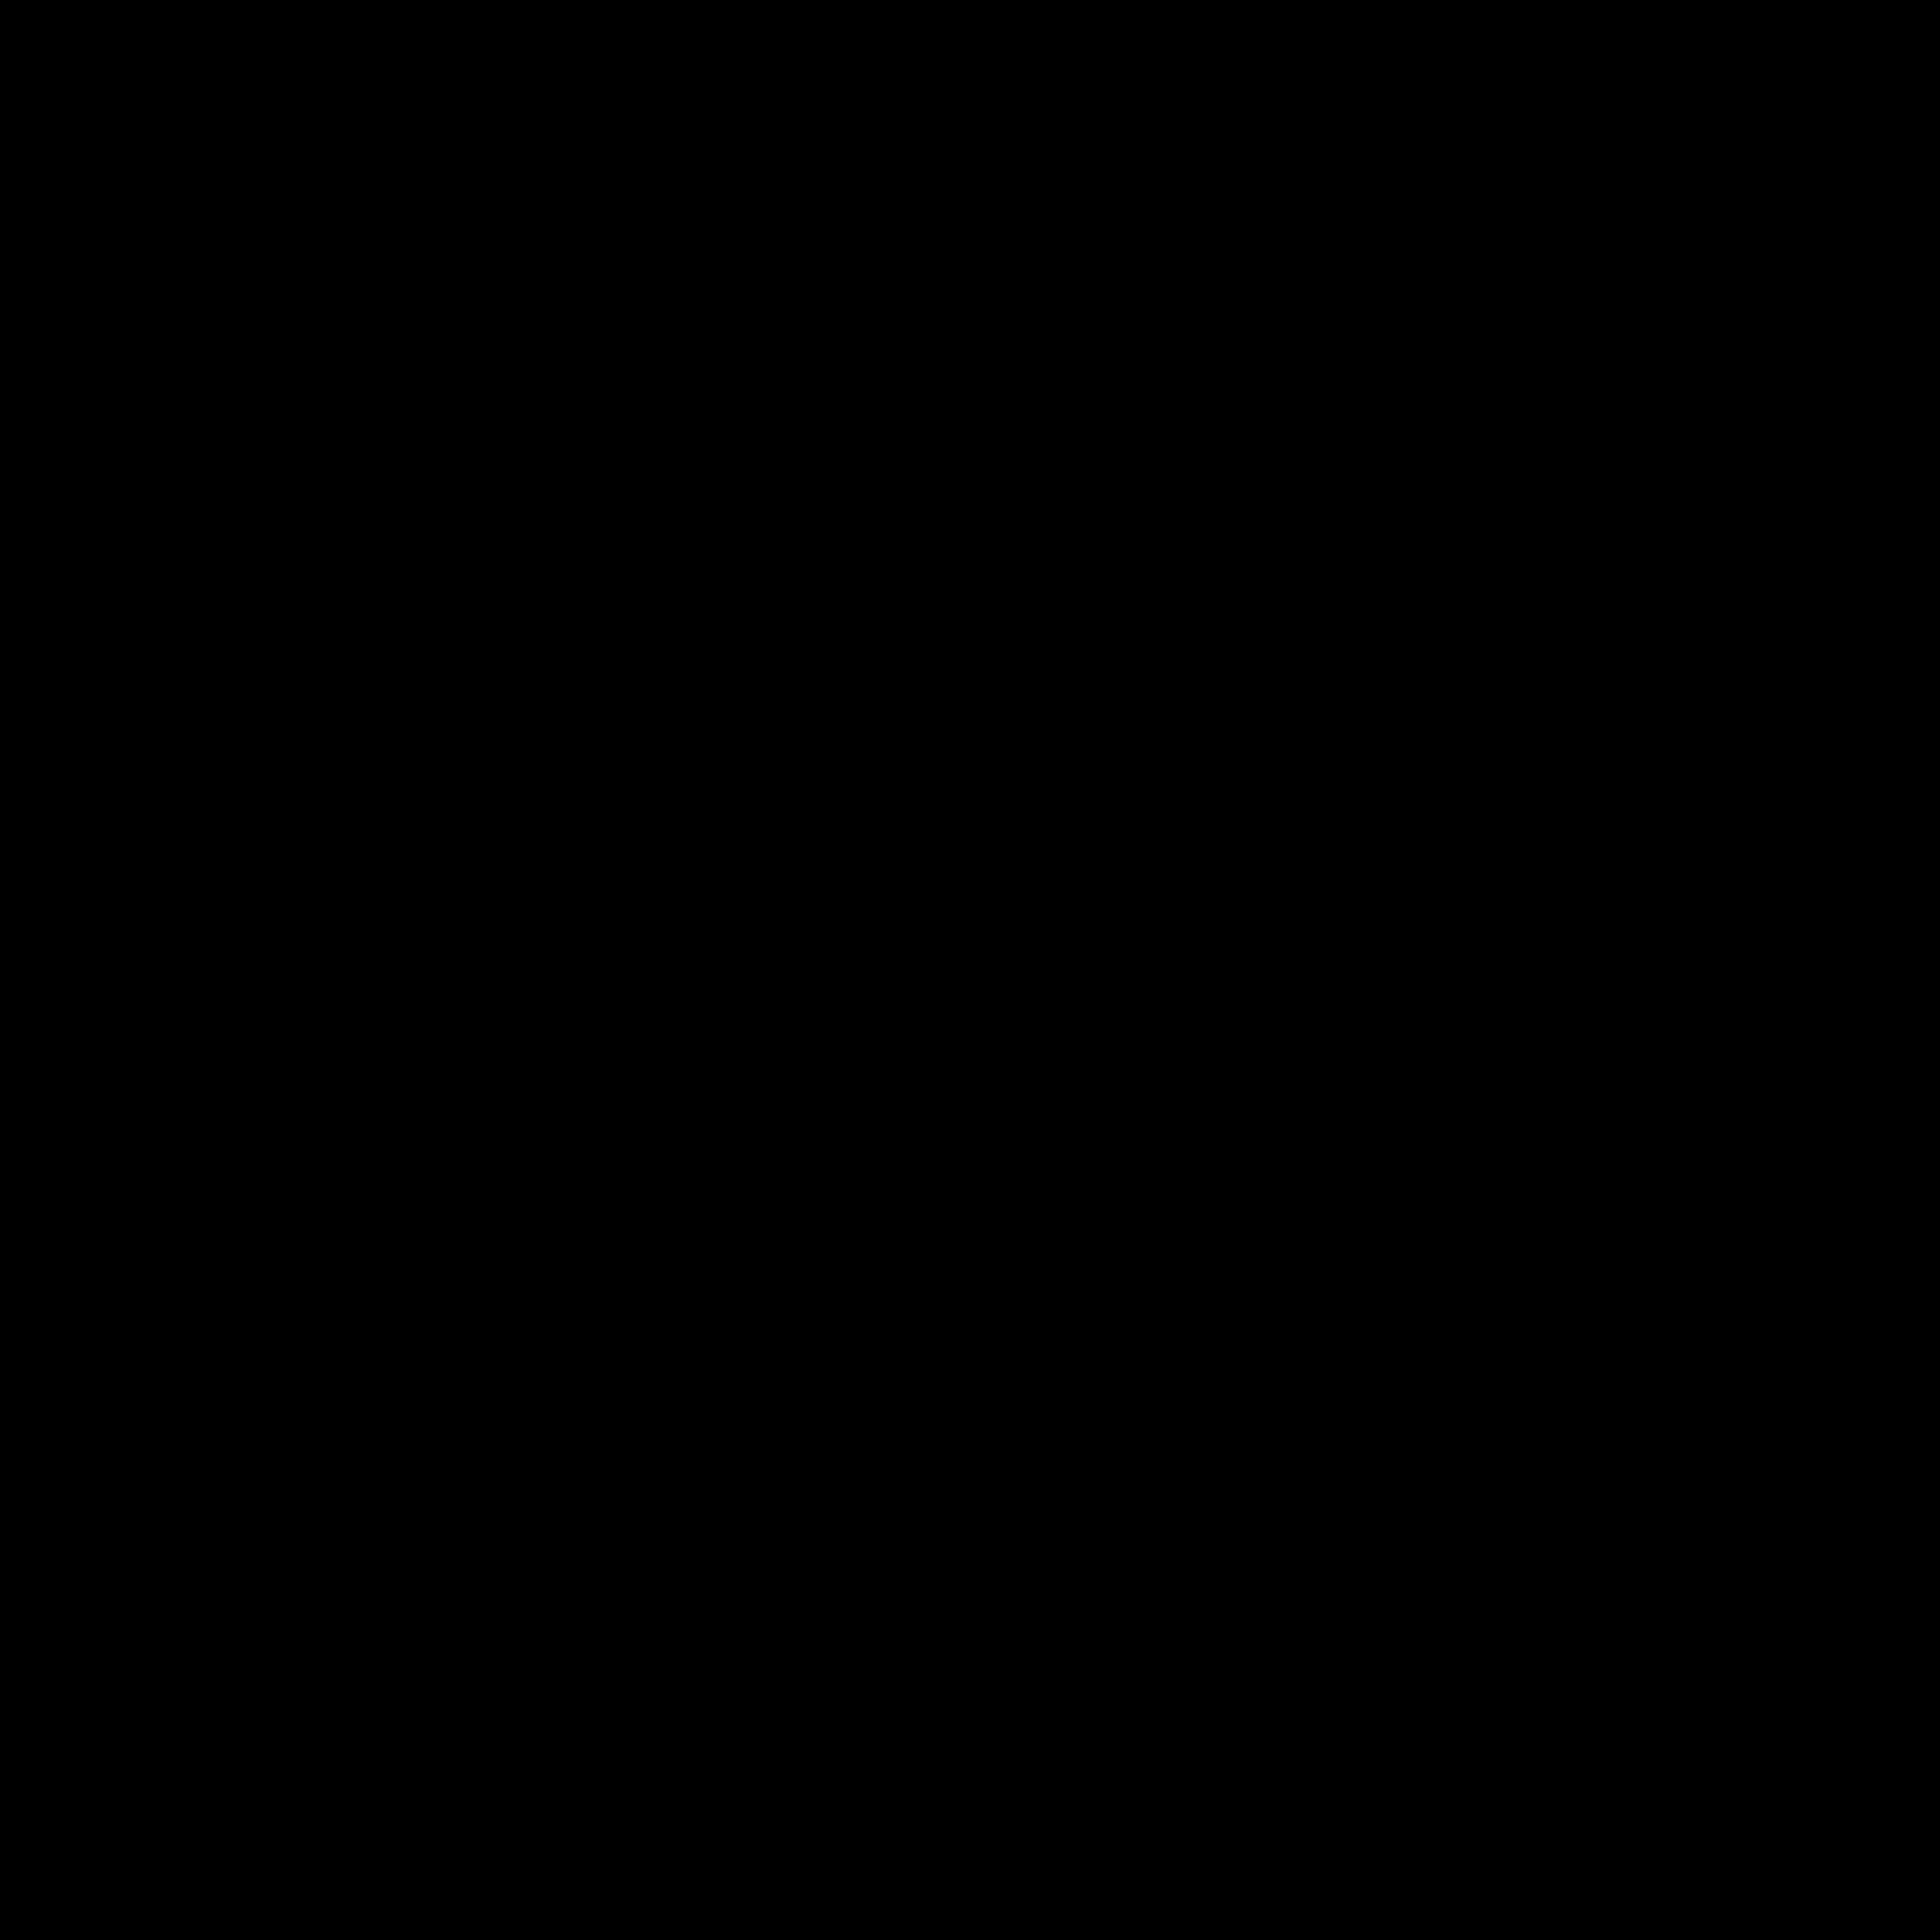 Black Iphone Wallpaper: IPhone 6 Carbon Fiber Wallpaper (76+ Images